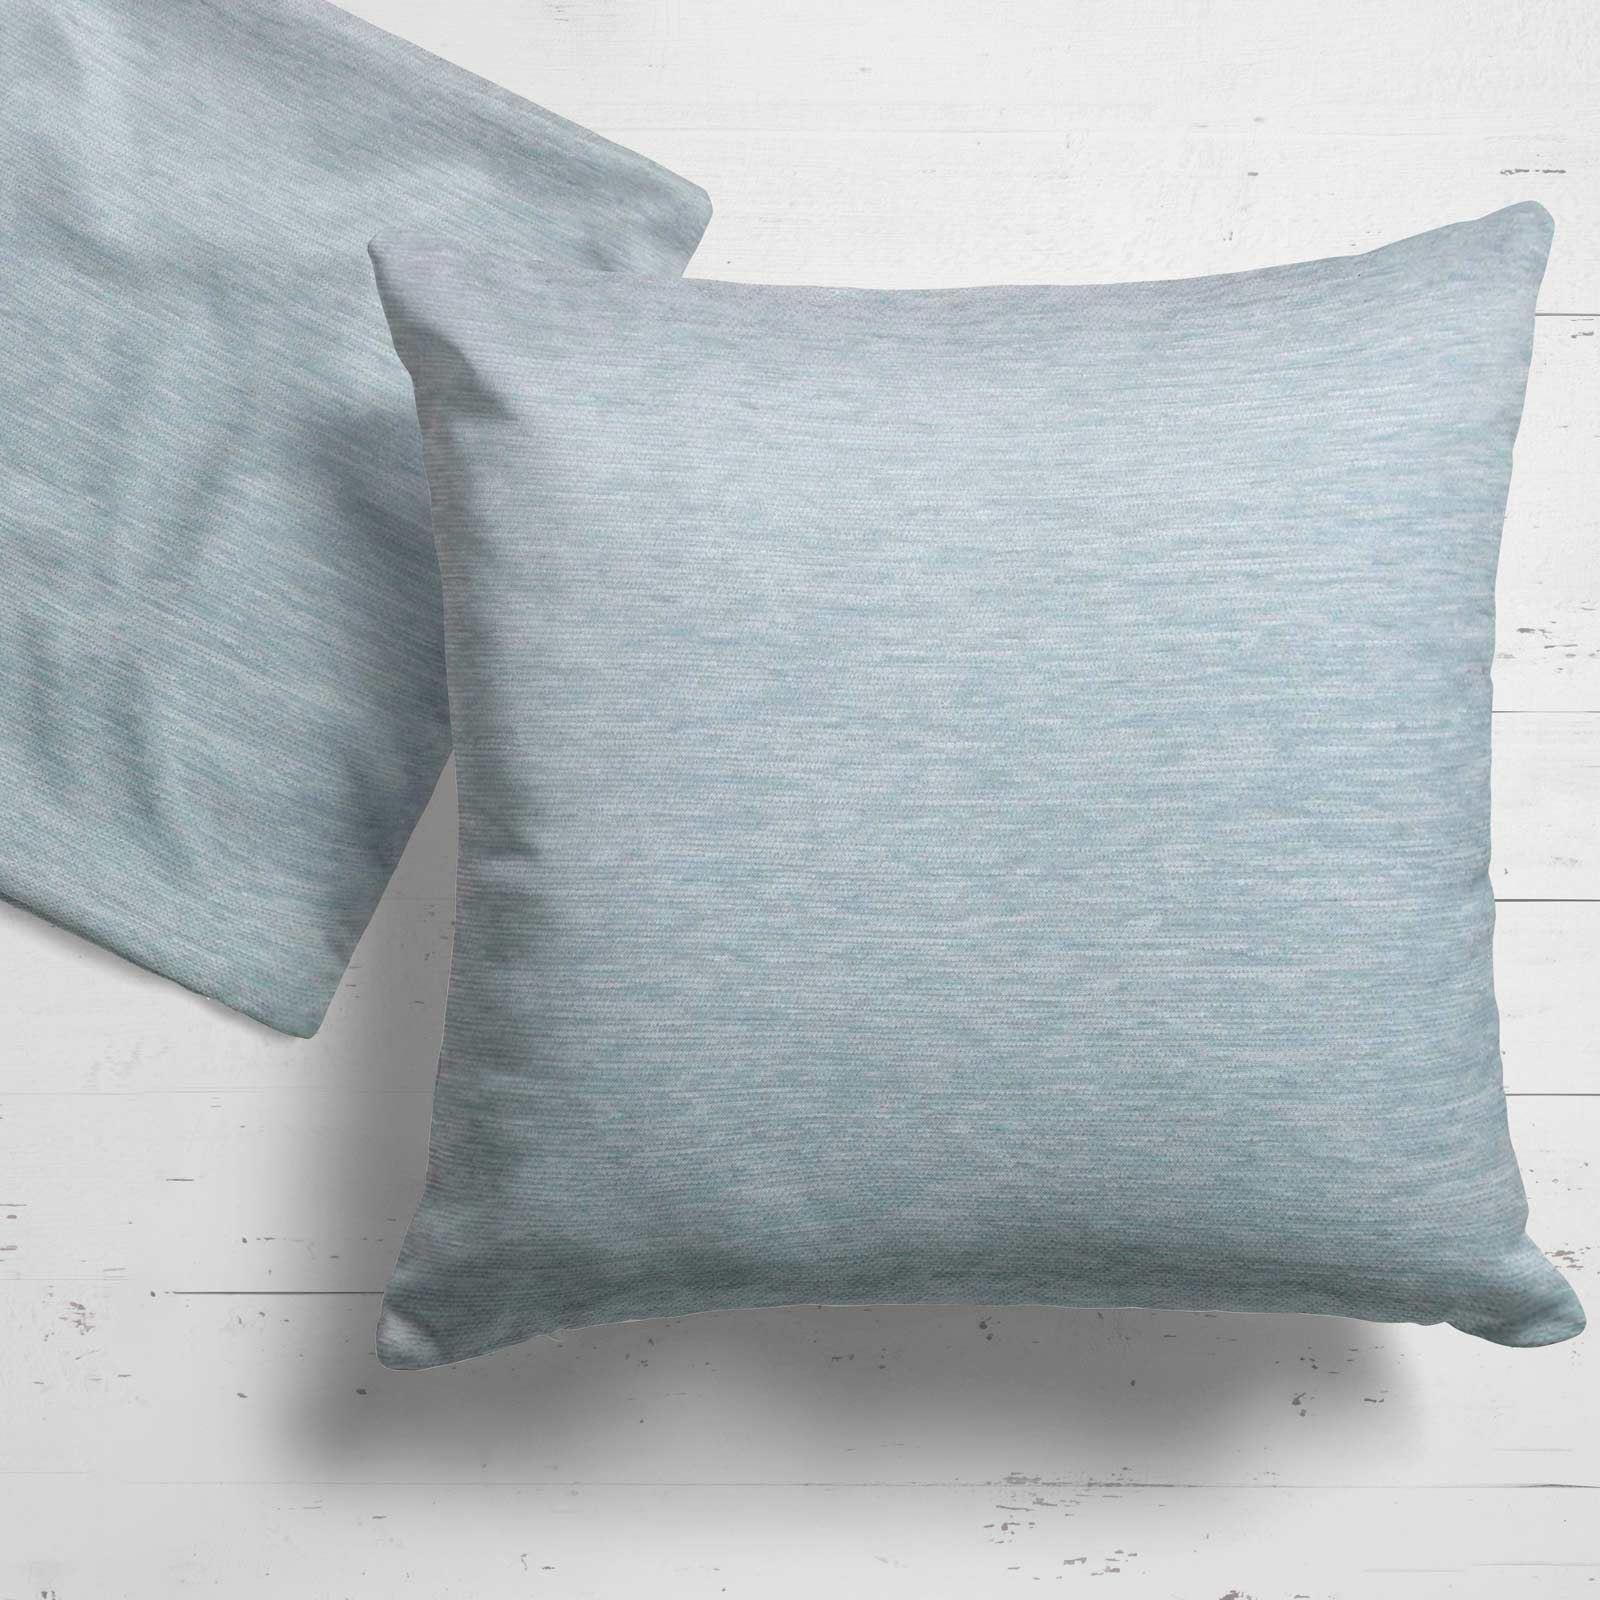 Set-of-2-Chenille-Cushion-Covers-Luxury-Plain-Cushions-Cover-Pairs-18-034-x-18-034 thumbnail 27